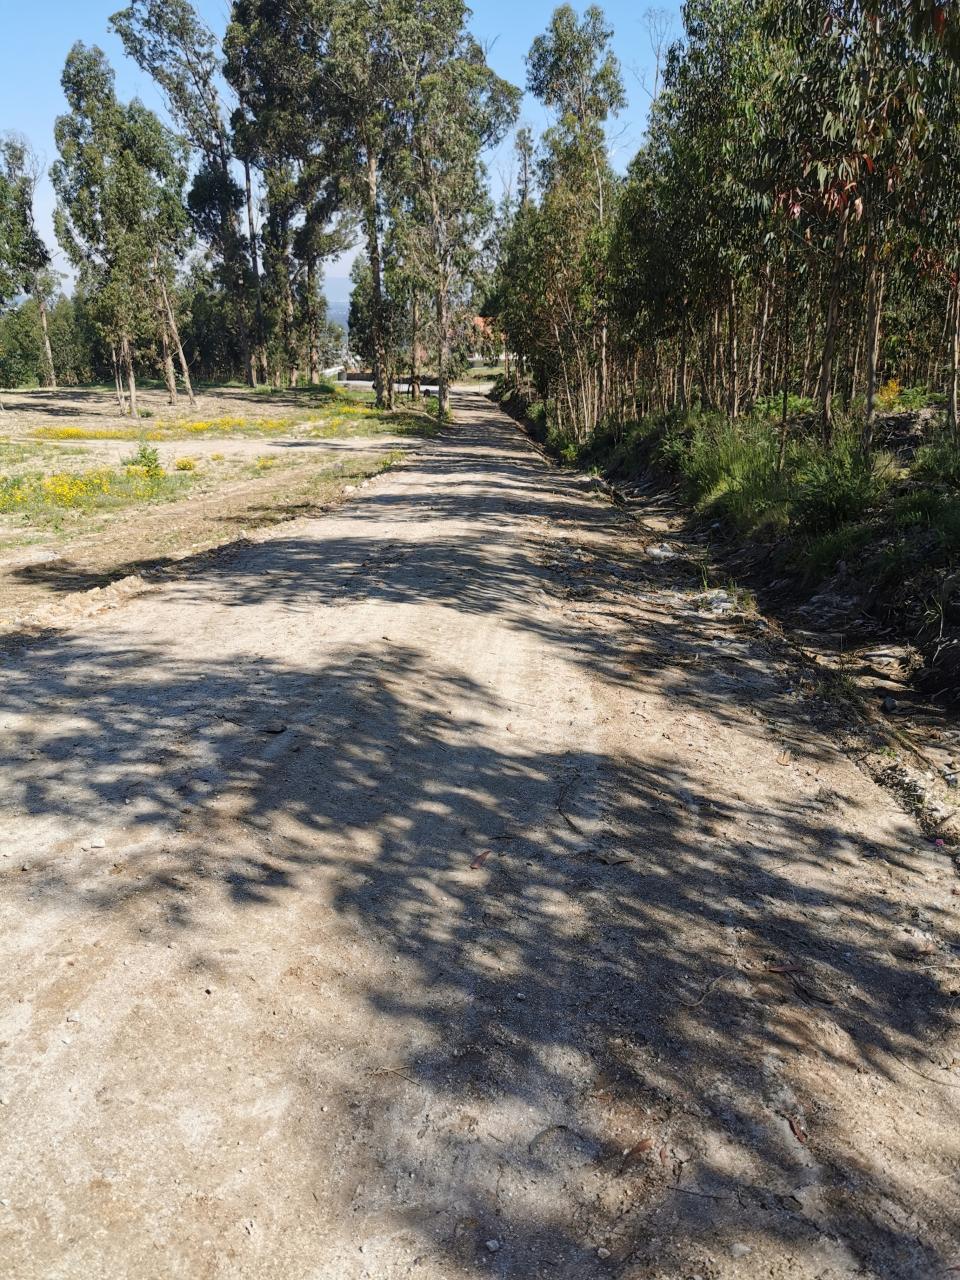 Estrada florestal